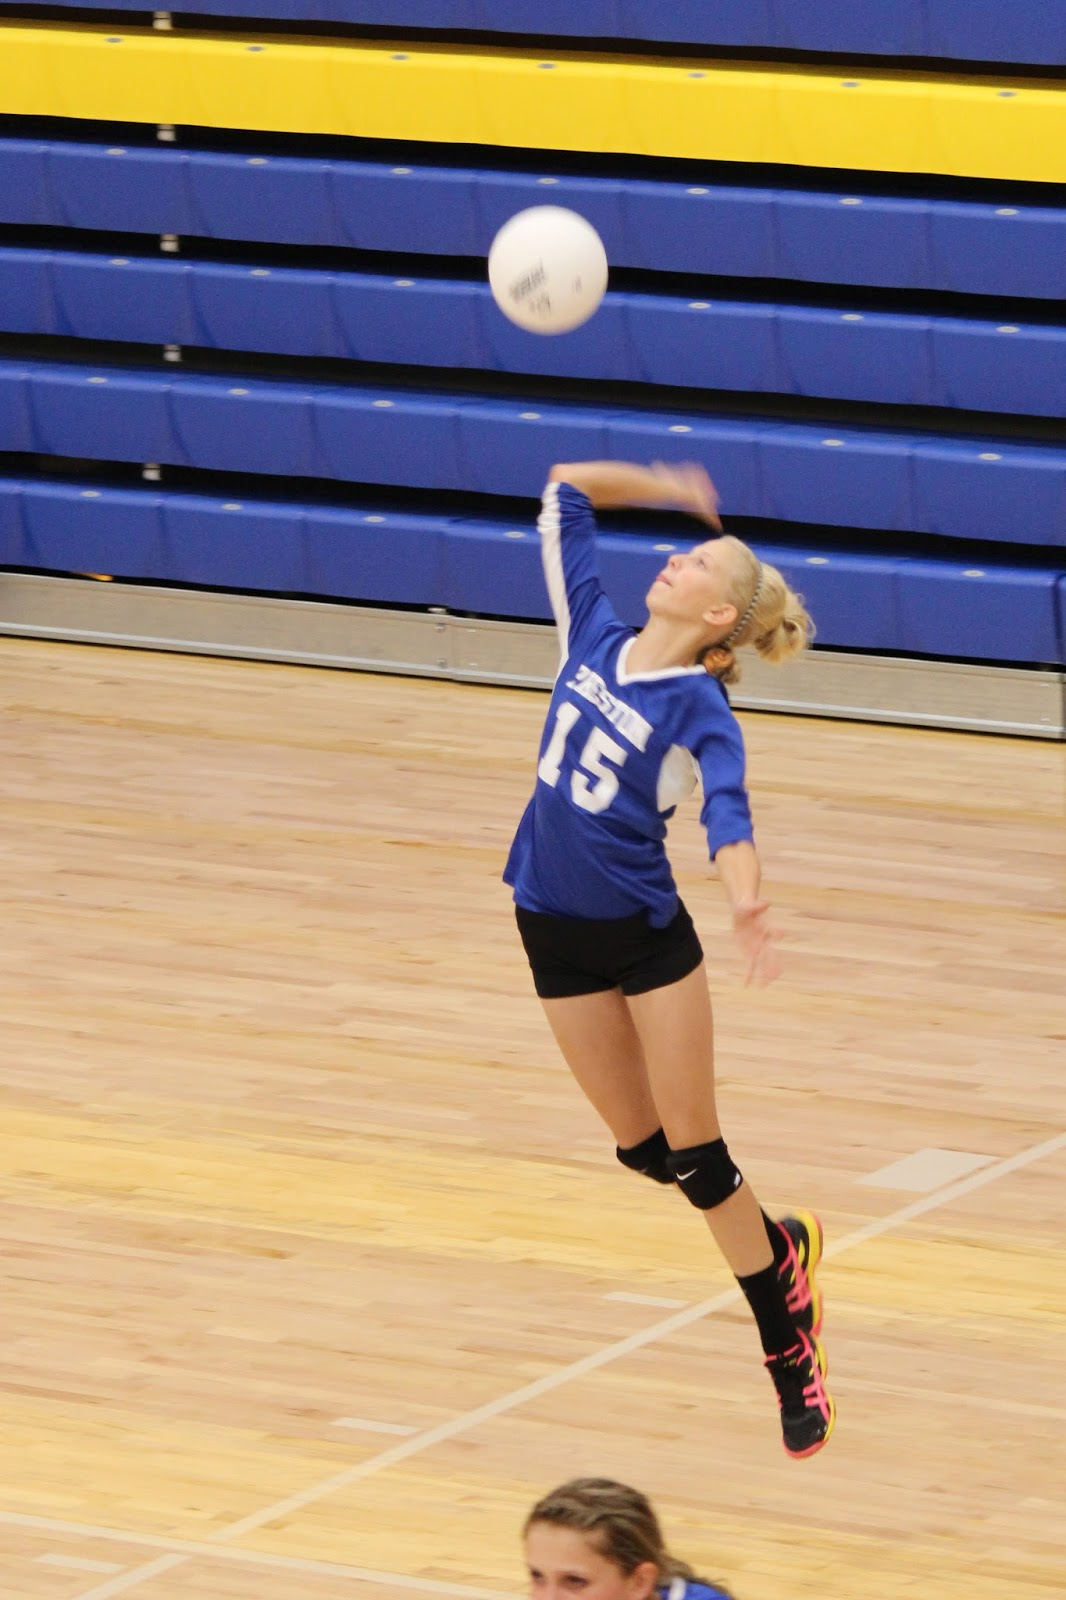 PHOTOS: Cooney girls volleyball team sweeps Watertown, 3-0